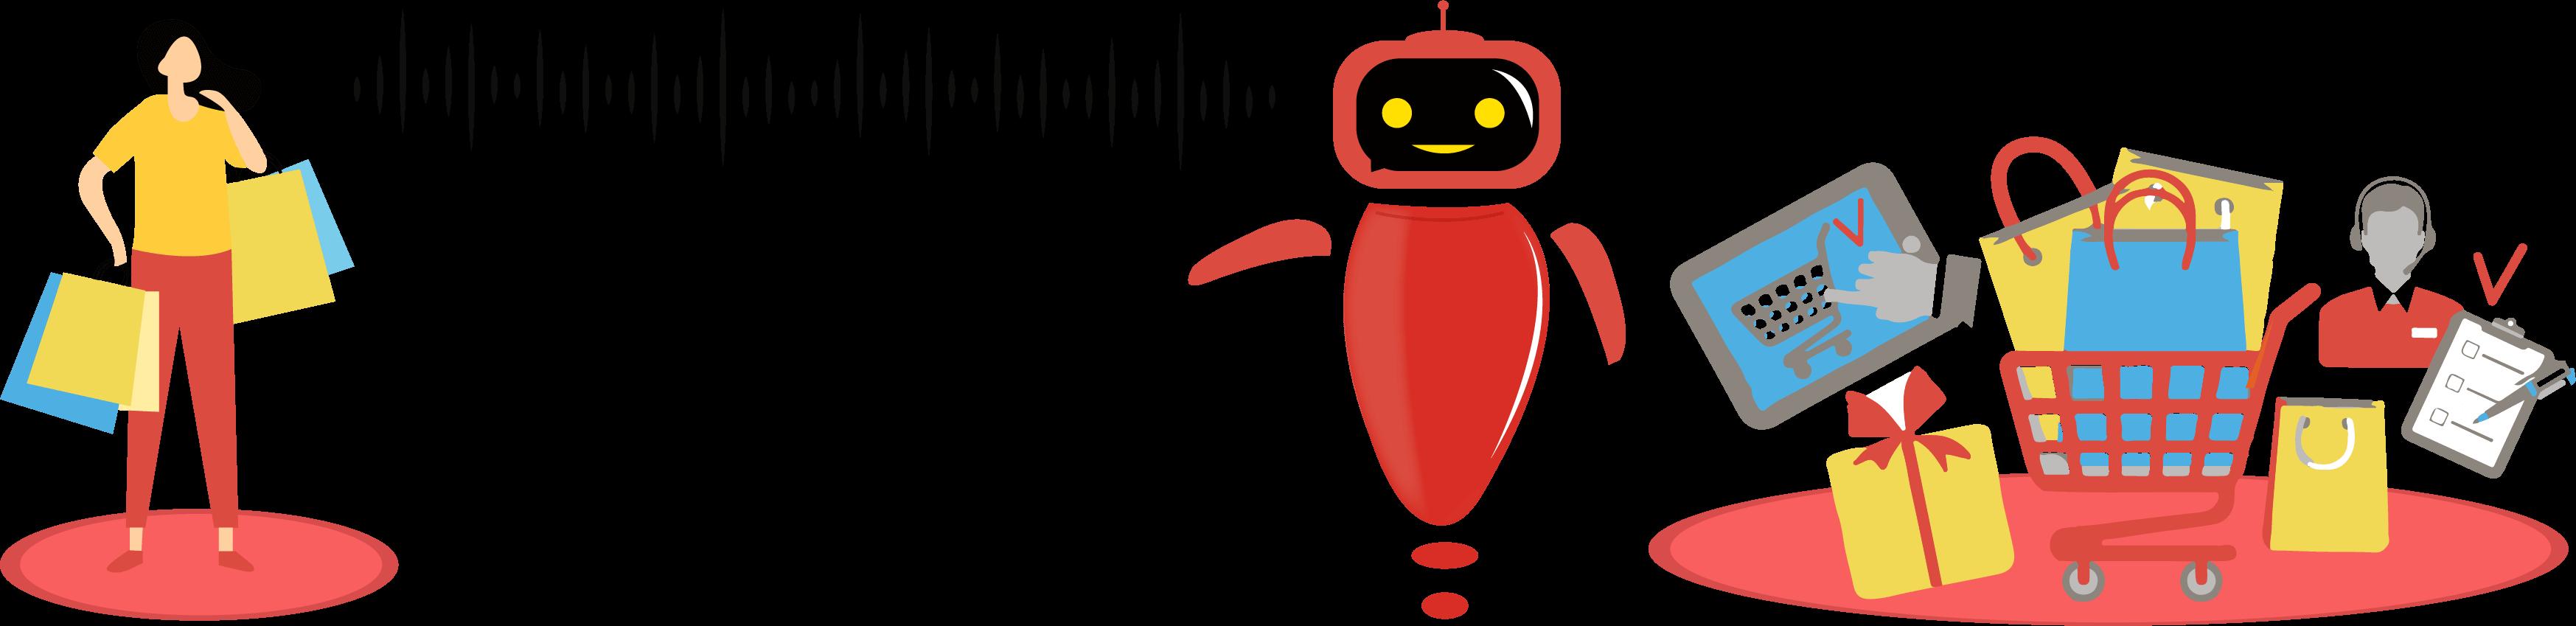 Kwantics Speech AI solutions assist customers through voice ordering